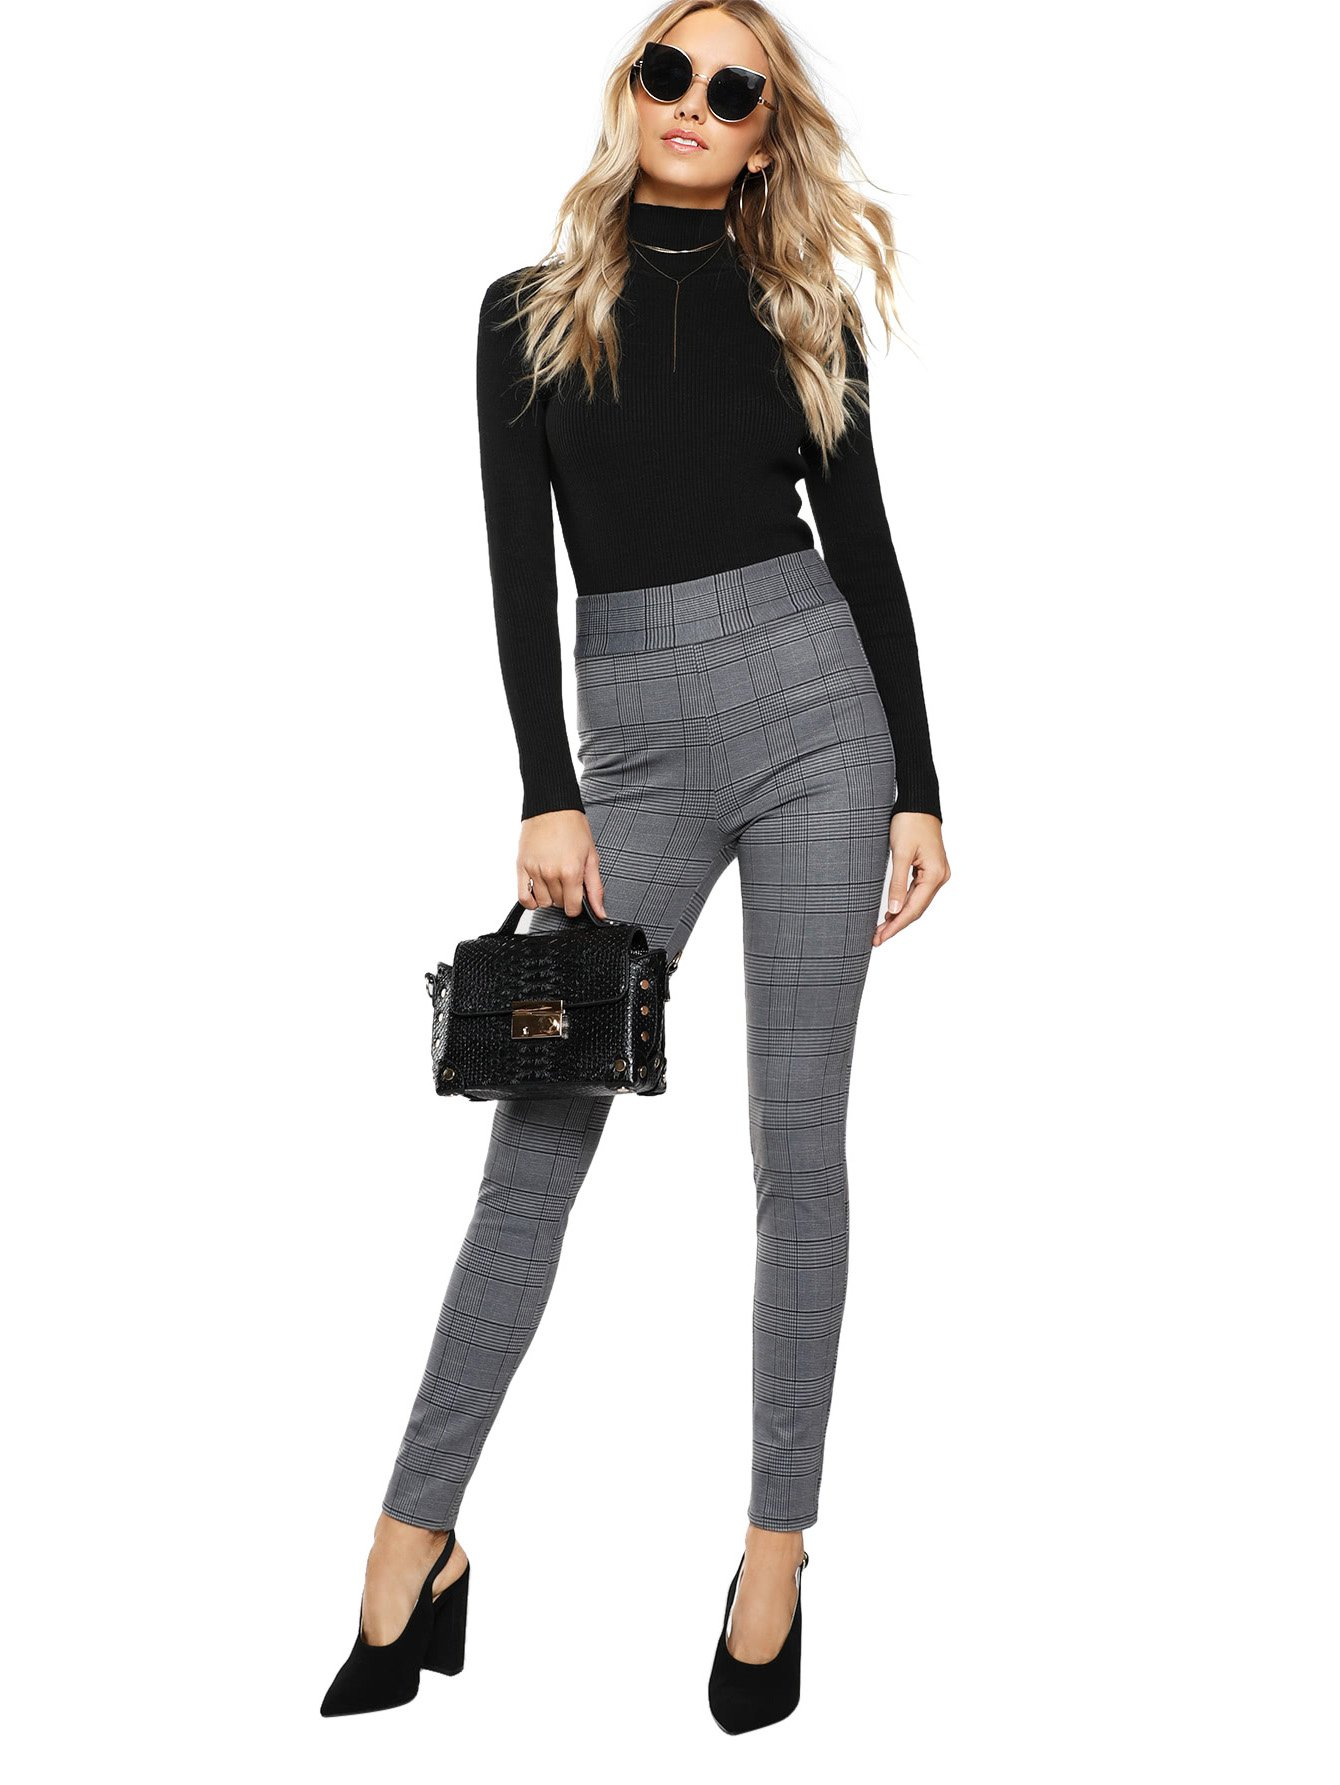 SweatyRocks Women's Casual High Waisted Ankle Plaid Pants Skinny Leggings, Grey #1, L by SweatyRocks (Image #4)